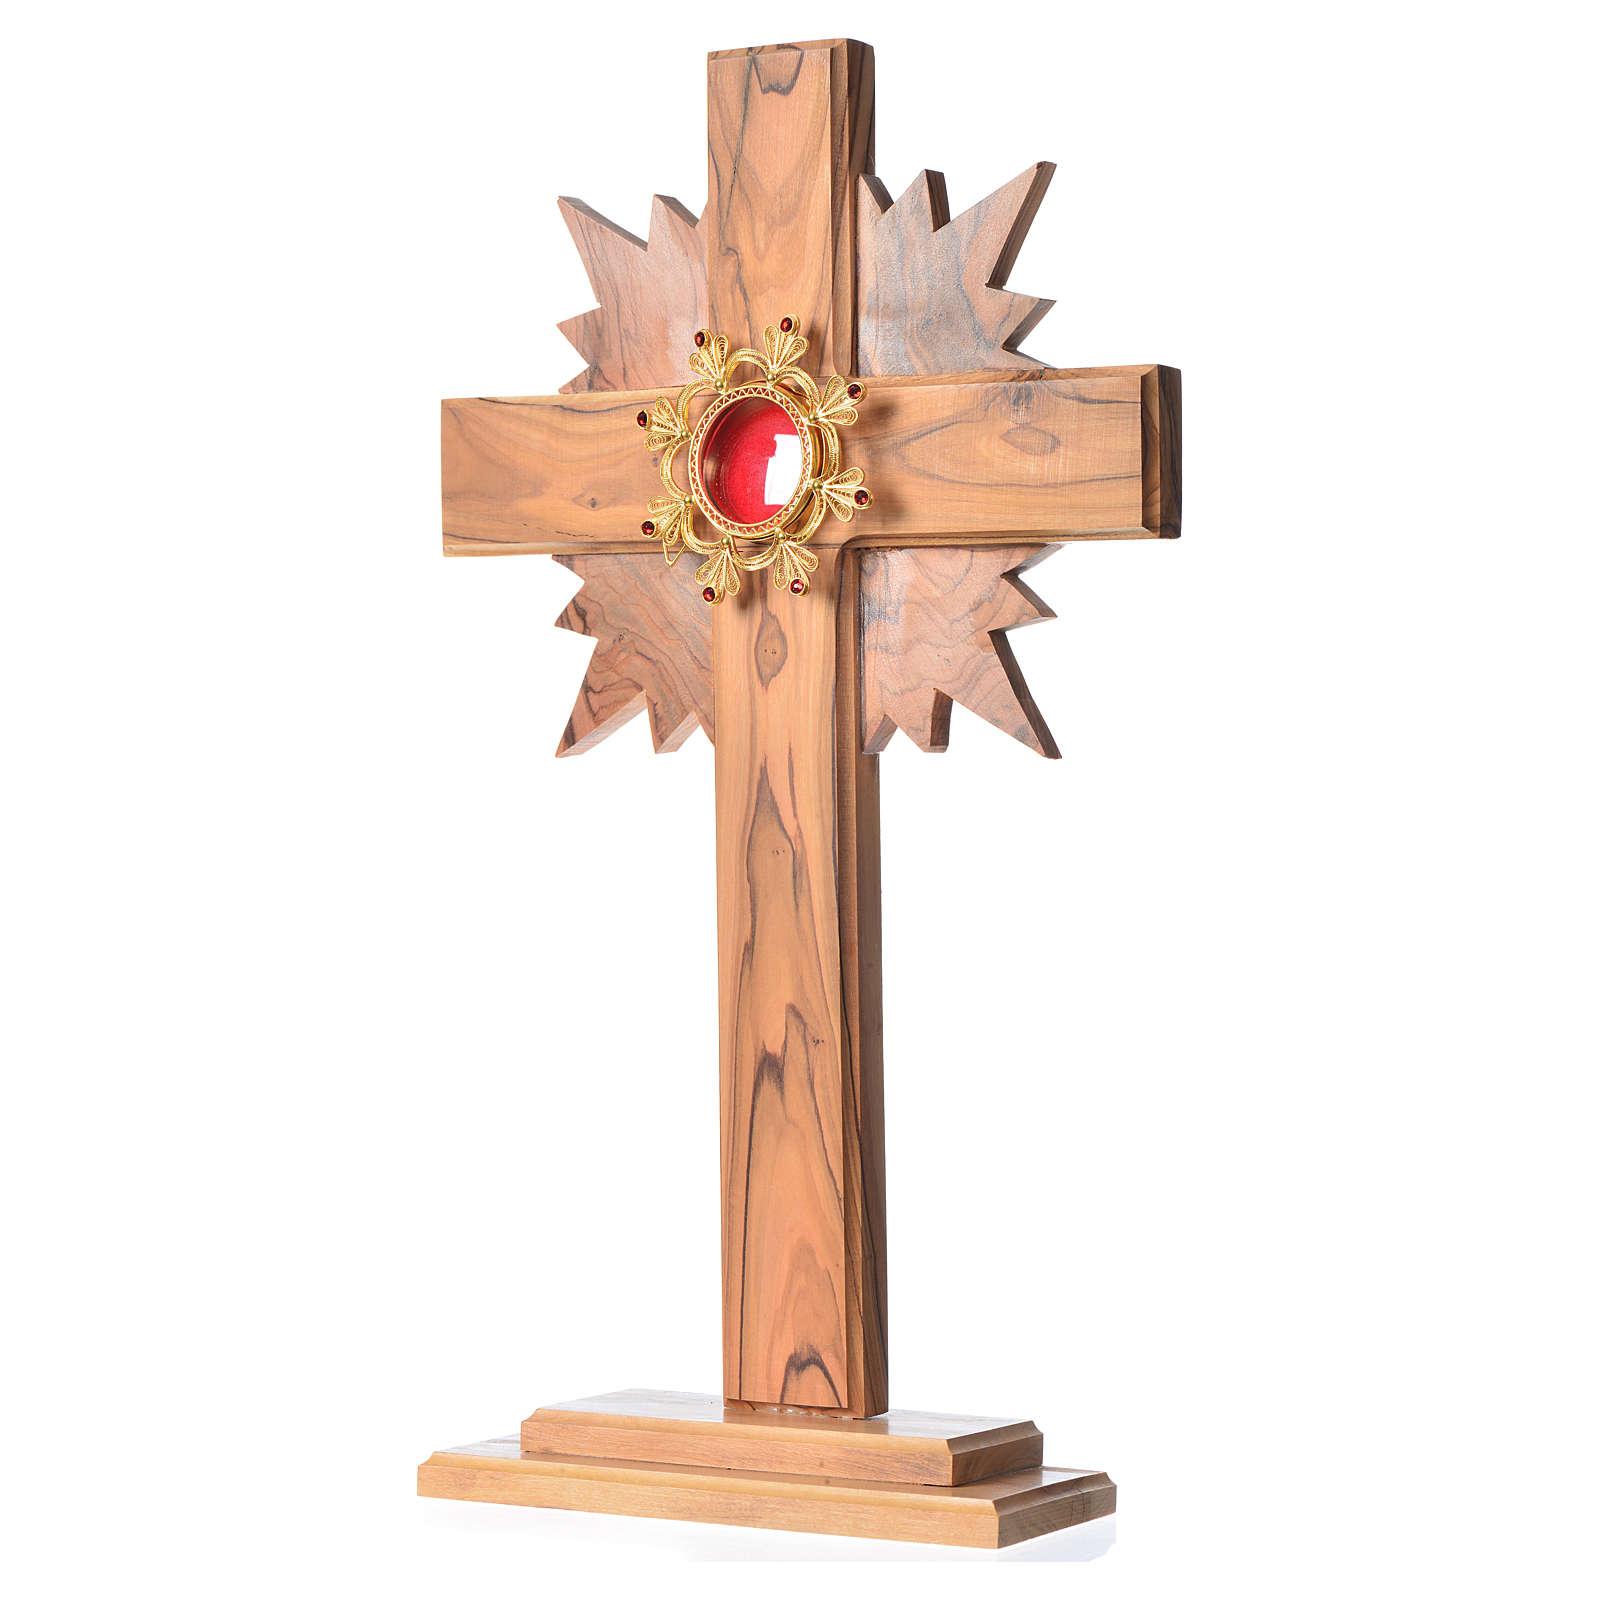 Relicario madera olivo rayos cruz 29 cm plata 800 4